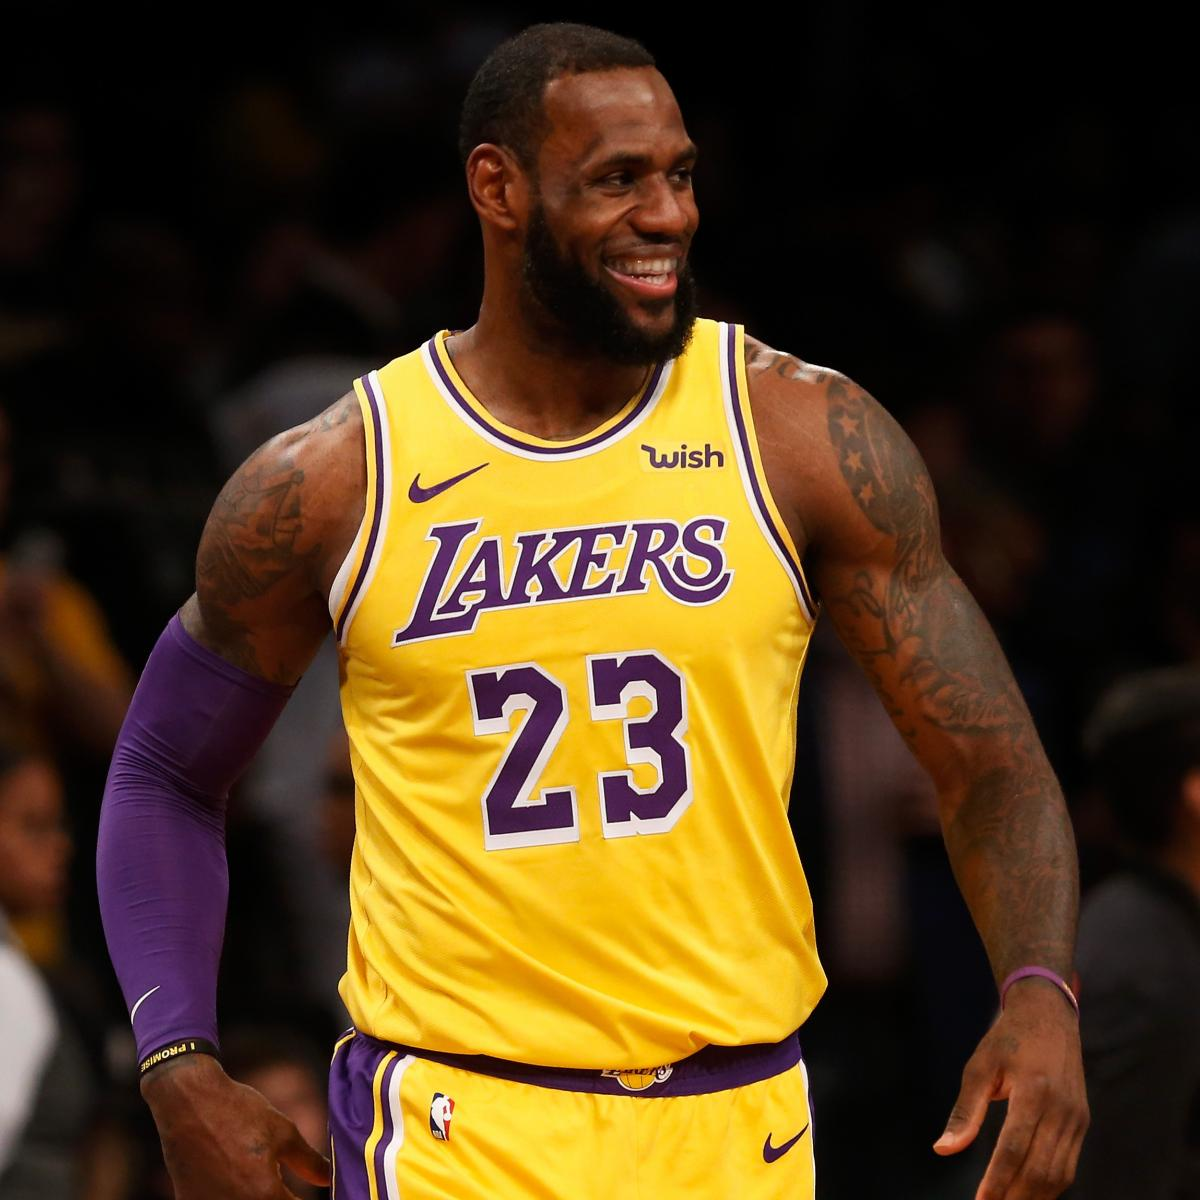 b1f52d12af1b LeBron James Passes Michael Jordan for 4th on NBA All-Time Scoring List